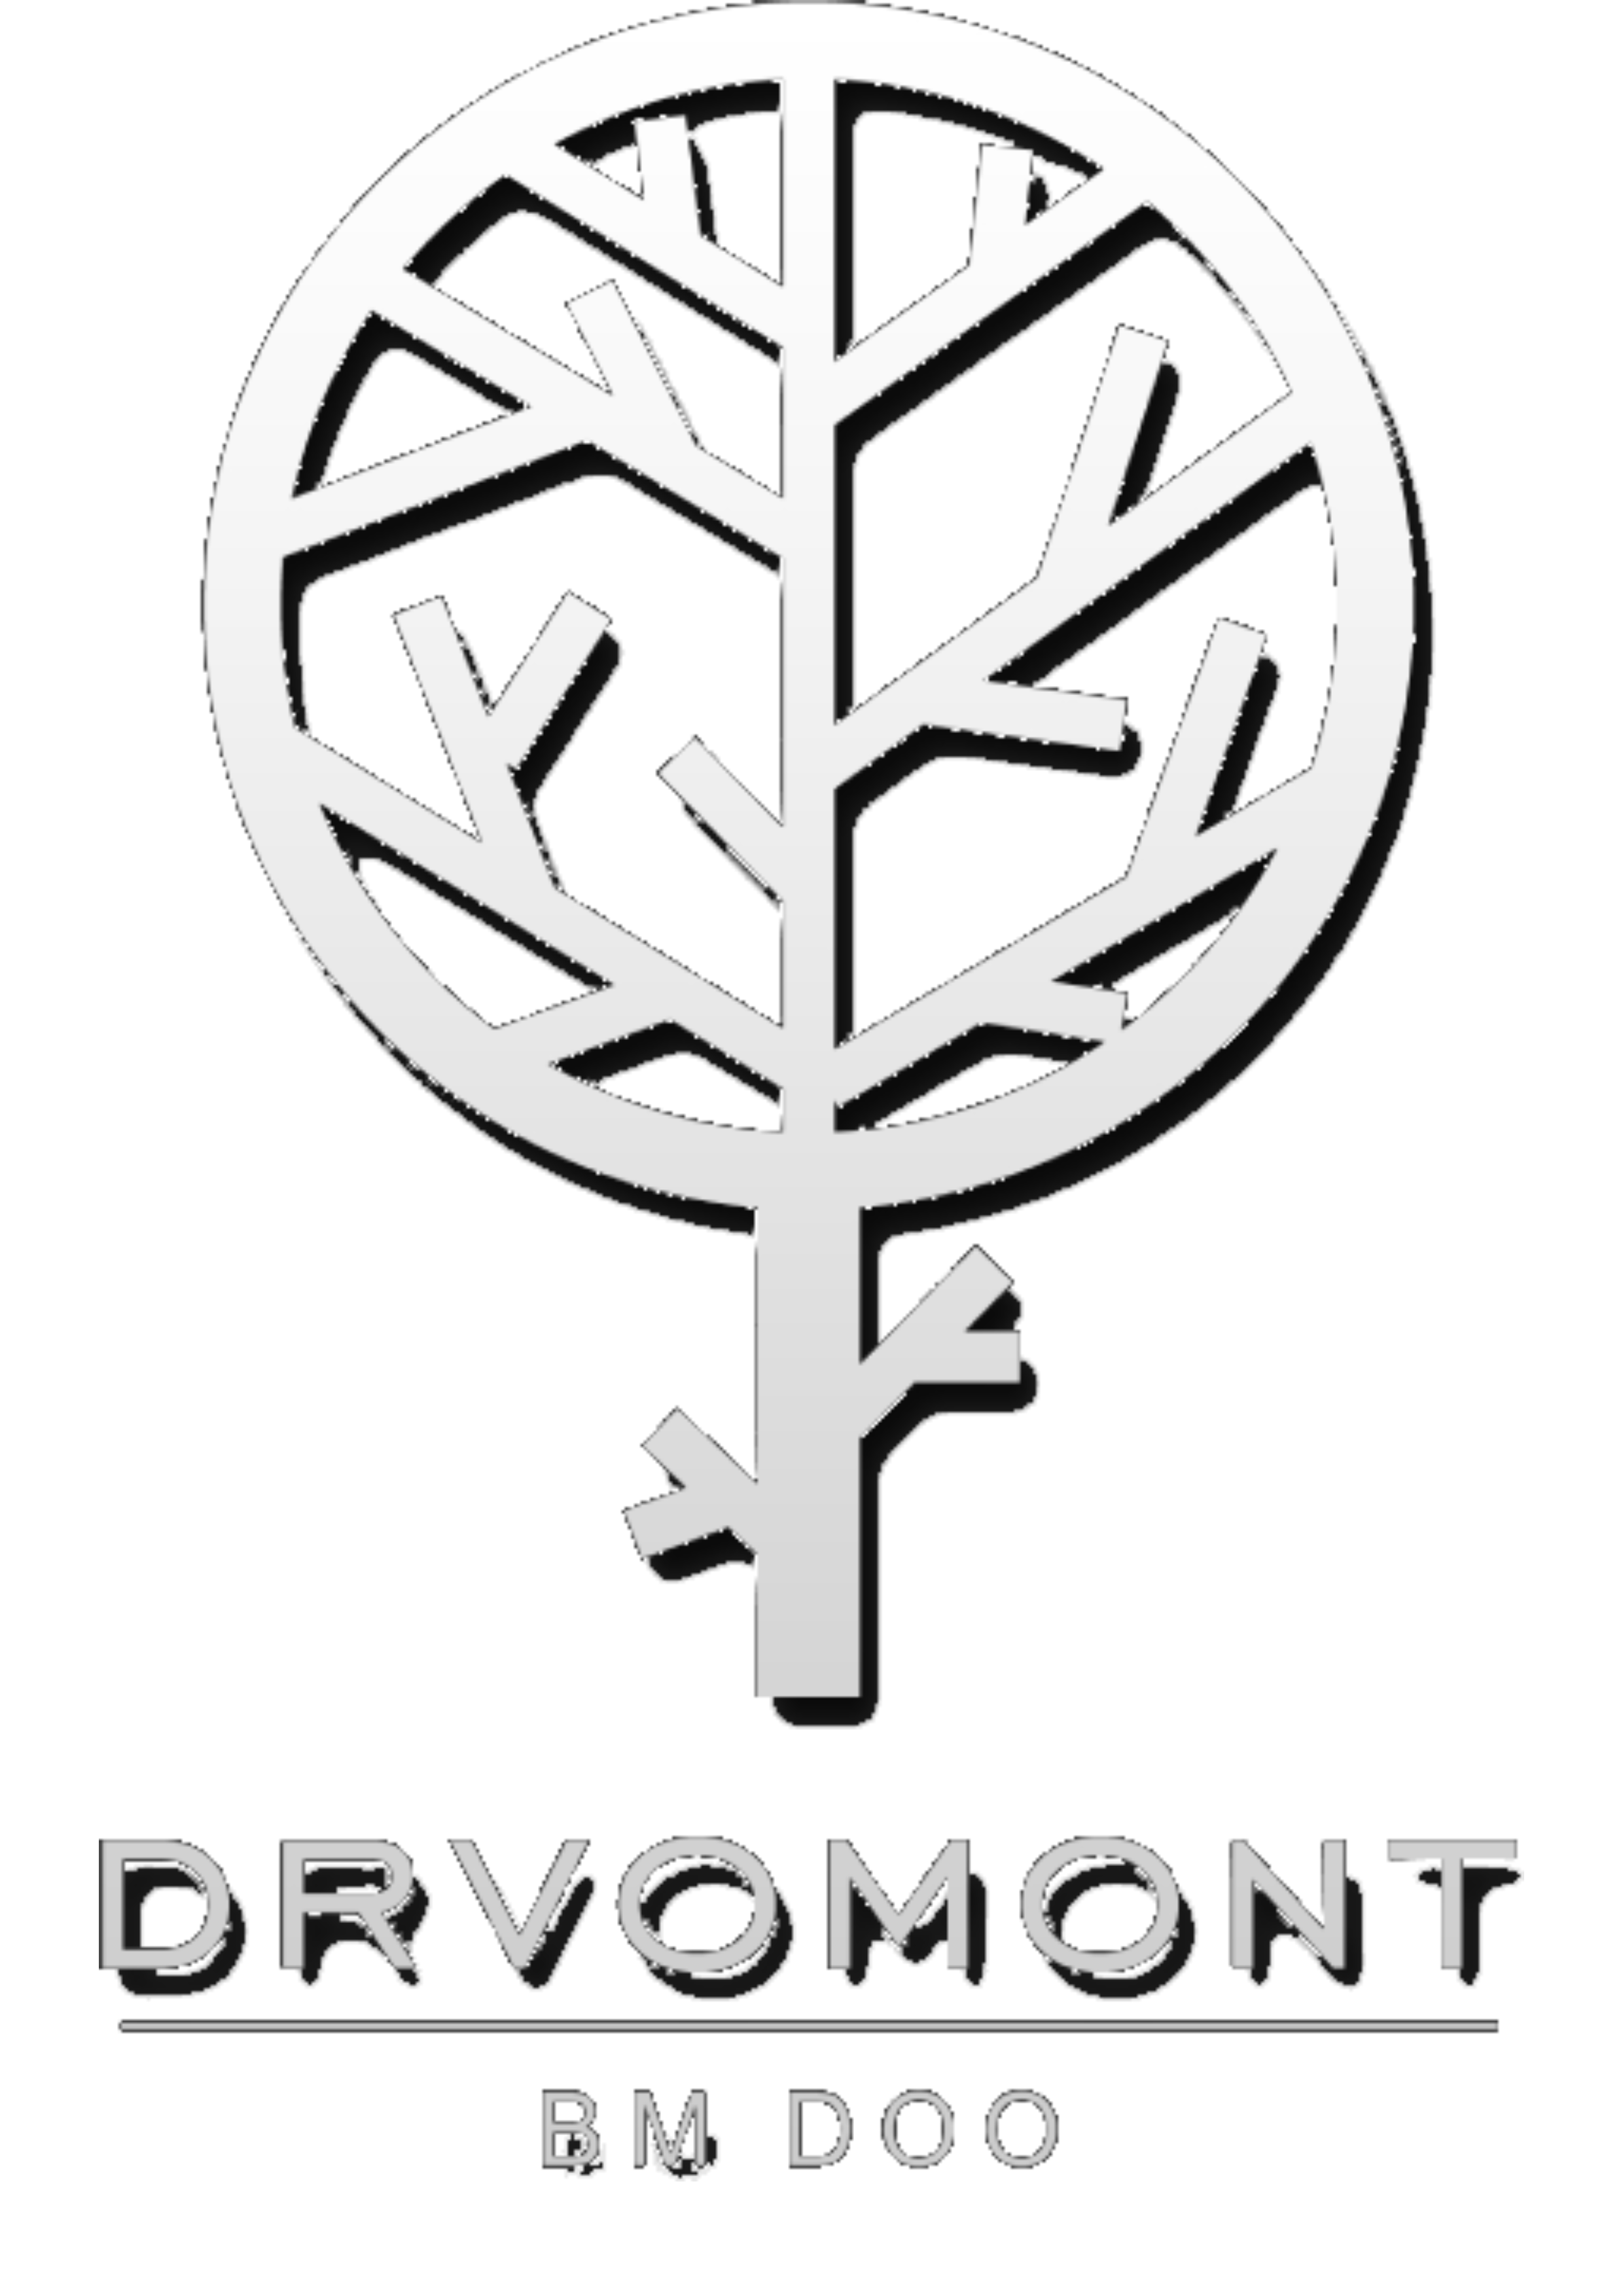 Drvomont BM